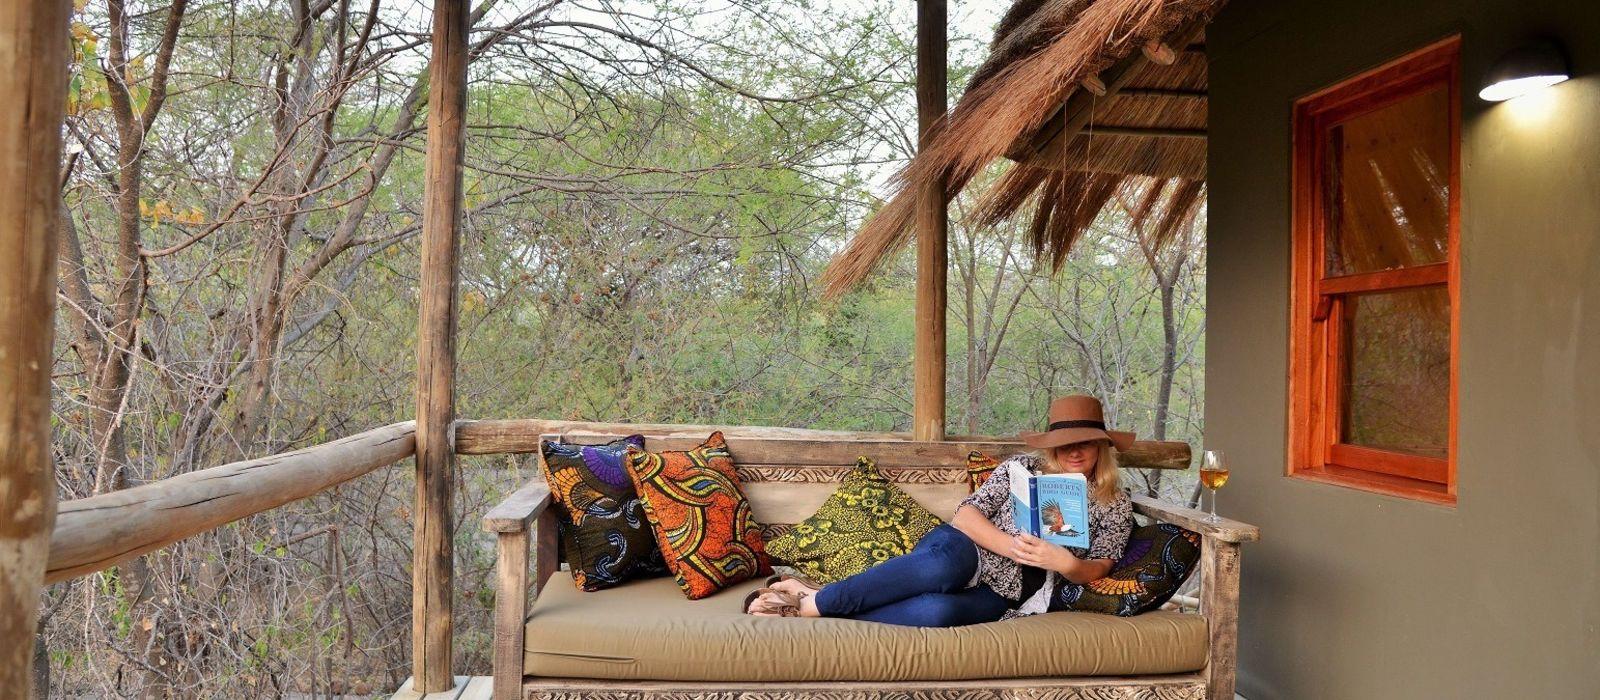 Victoria Falls and Botswana Highlights Tour Trip 5